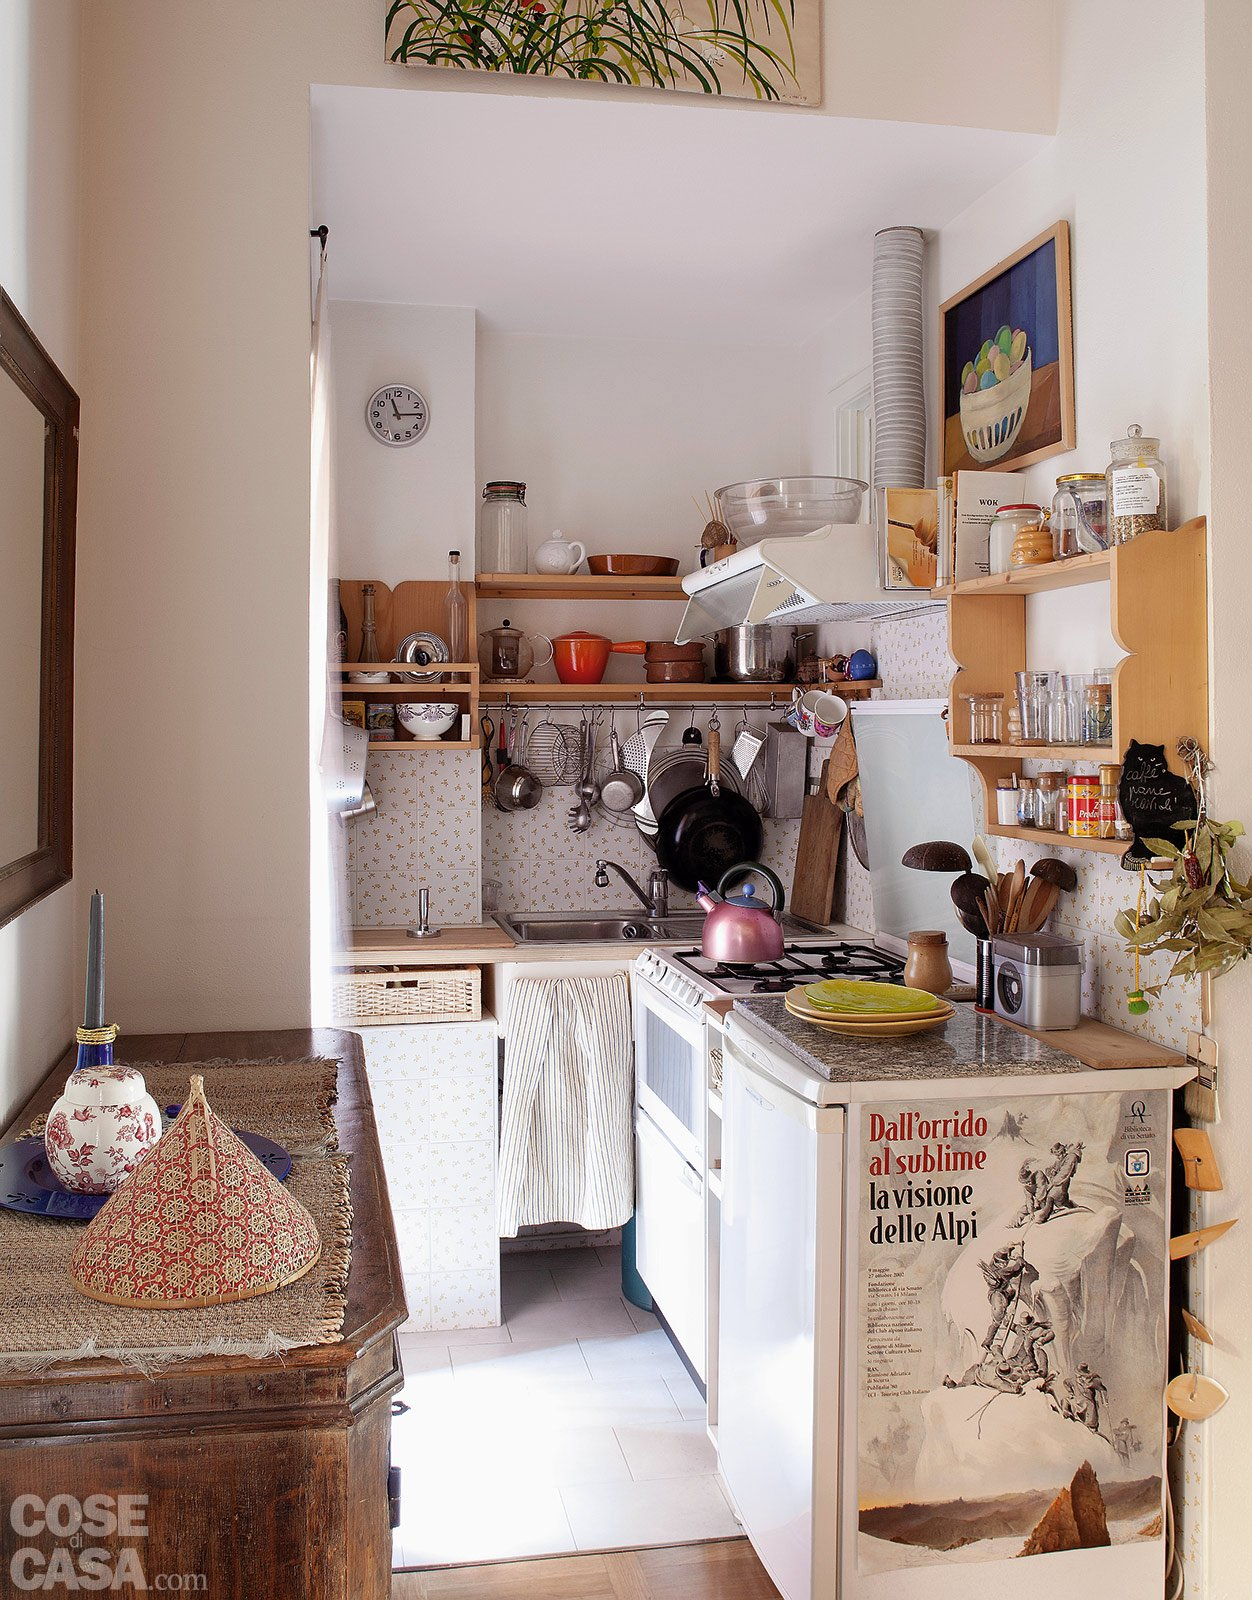 Bilocale di 40 mq una casa fai da te cose di casa - Arredo per la casa ...